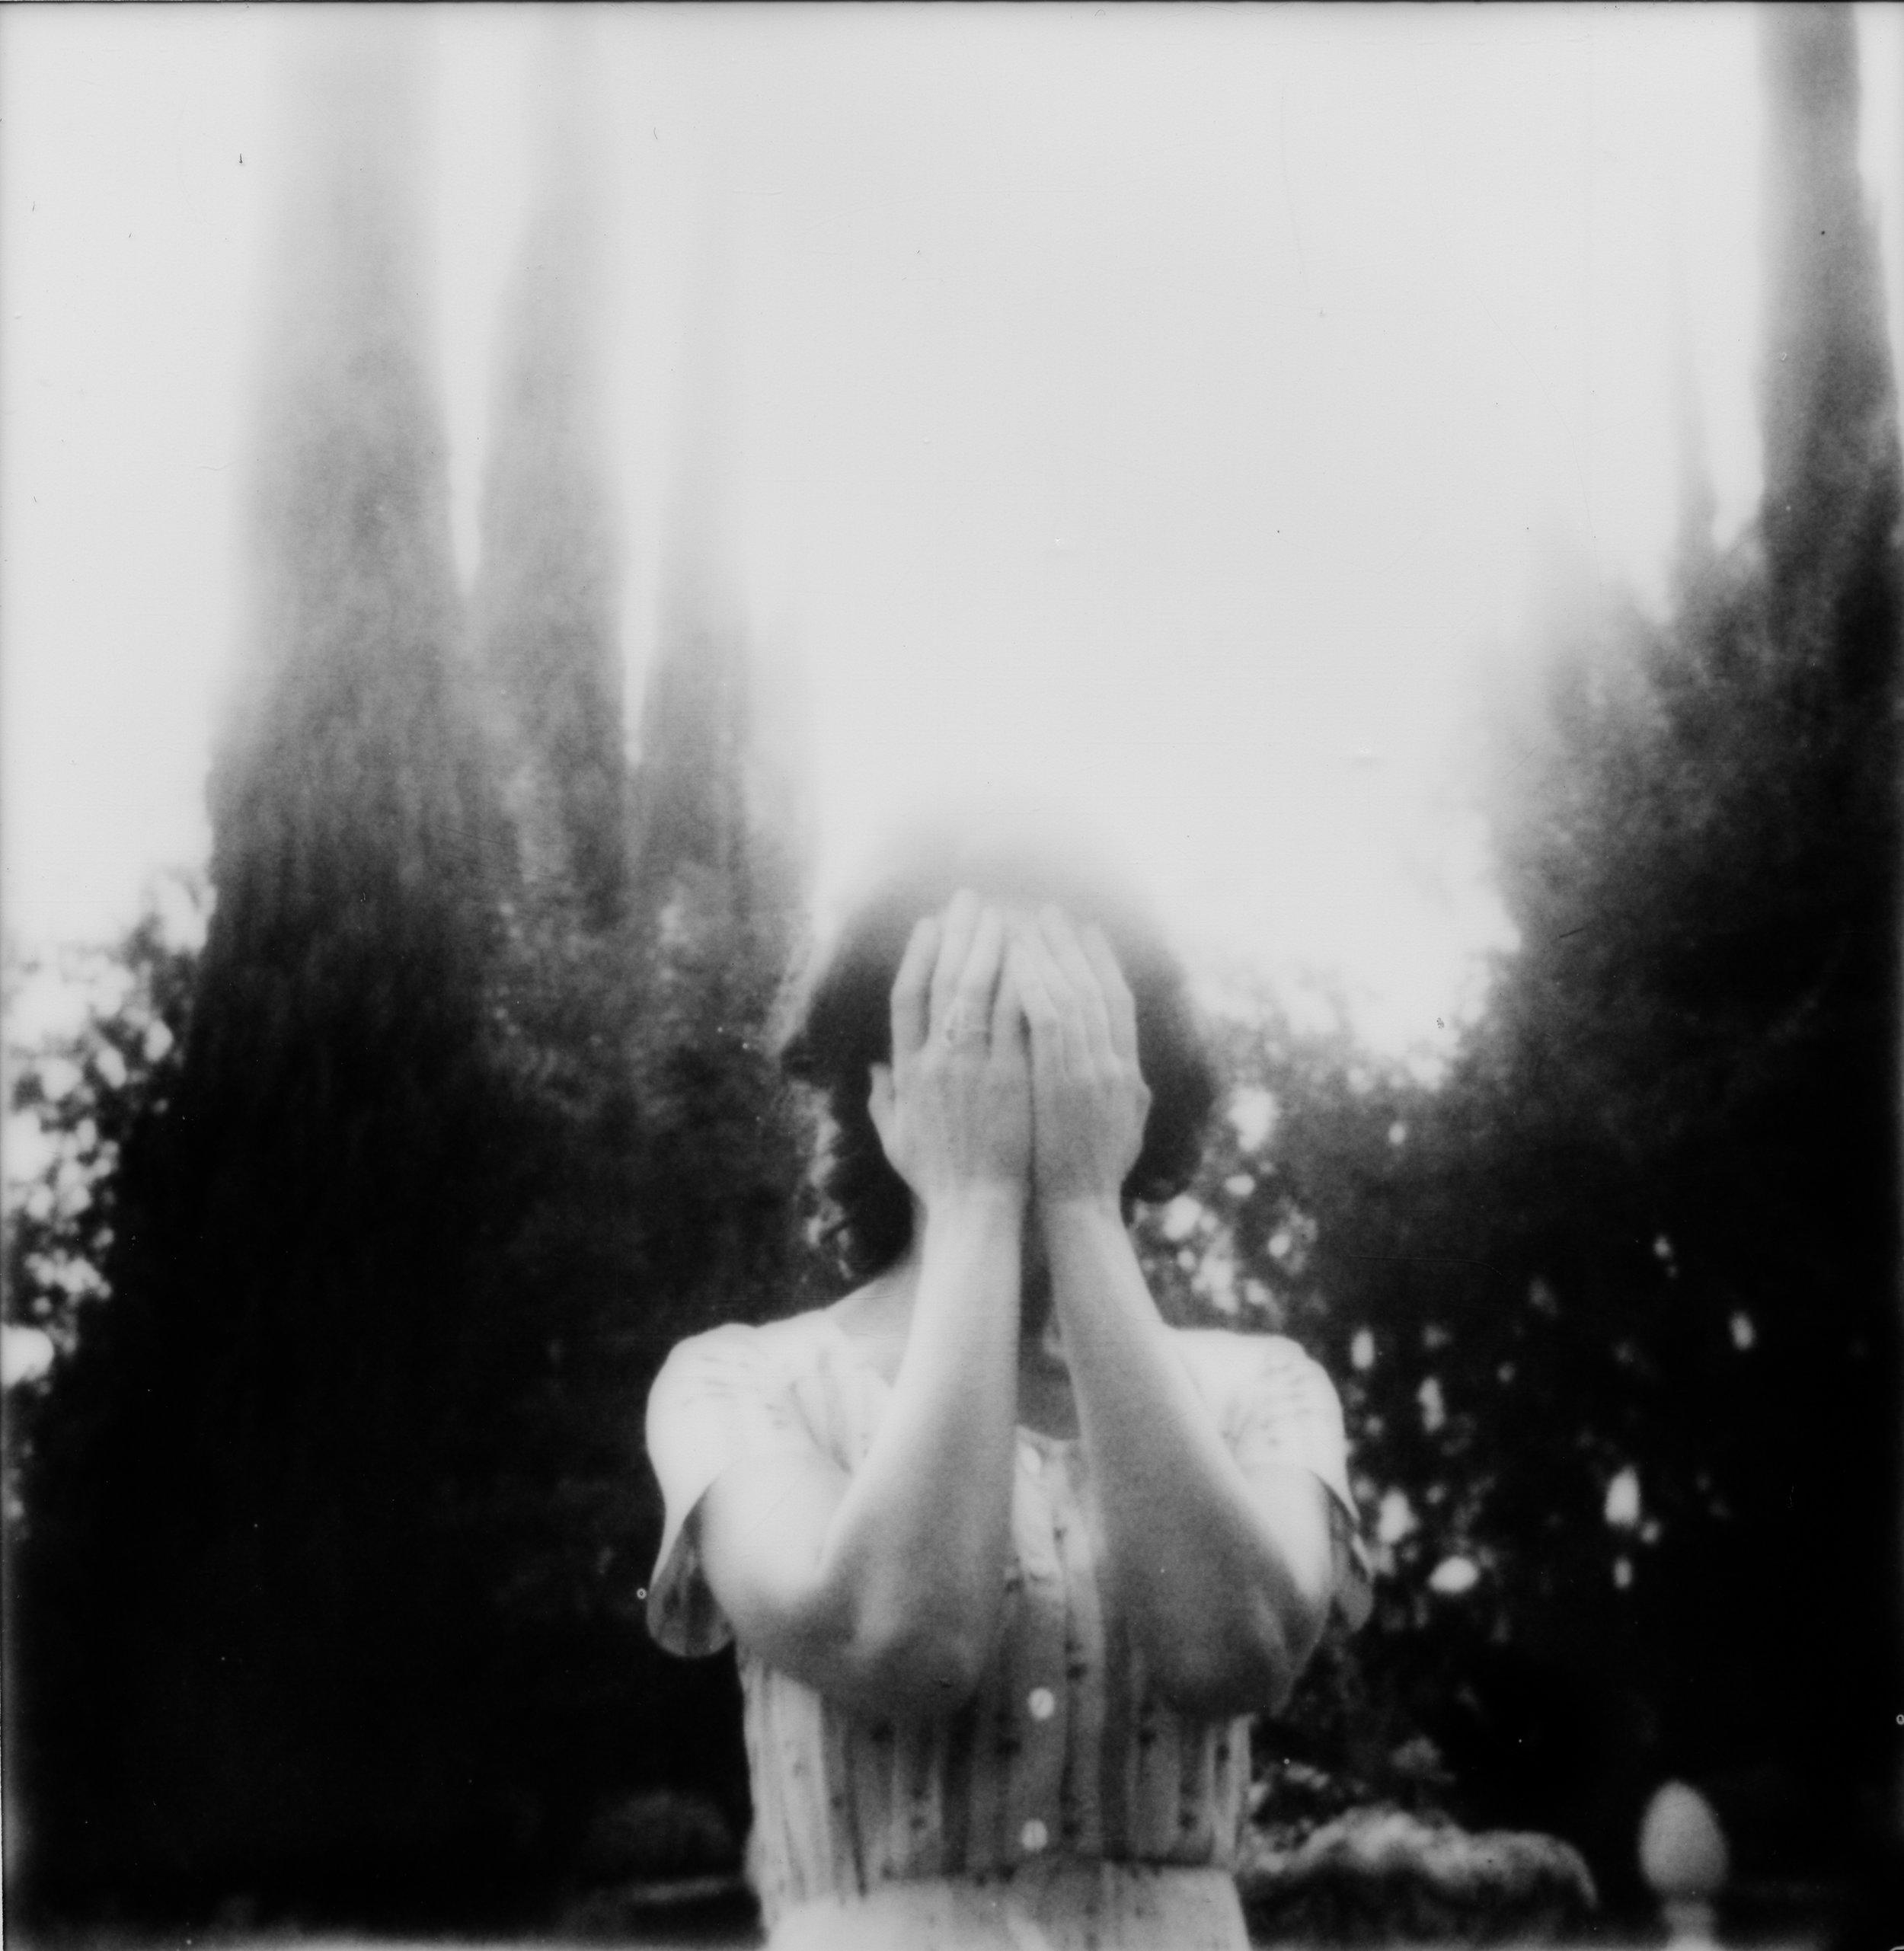 Arlington_PolaroidScan_17.jpg